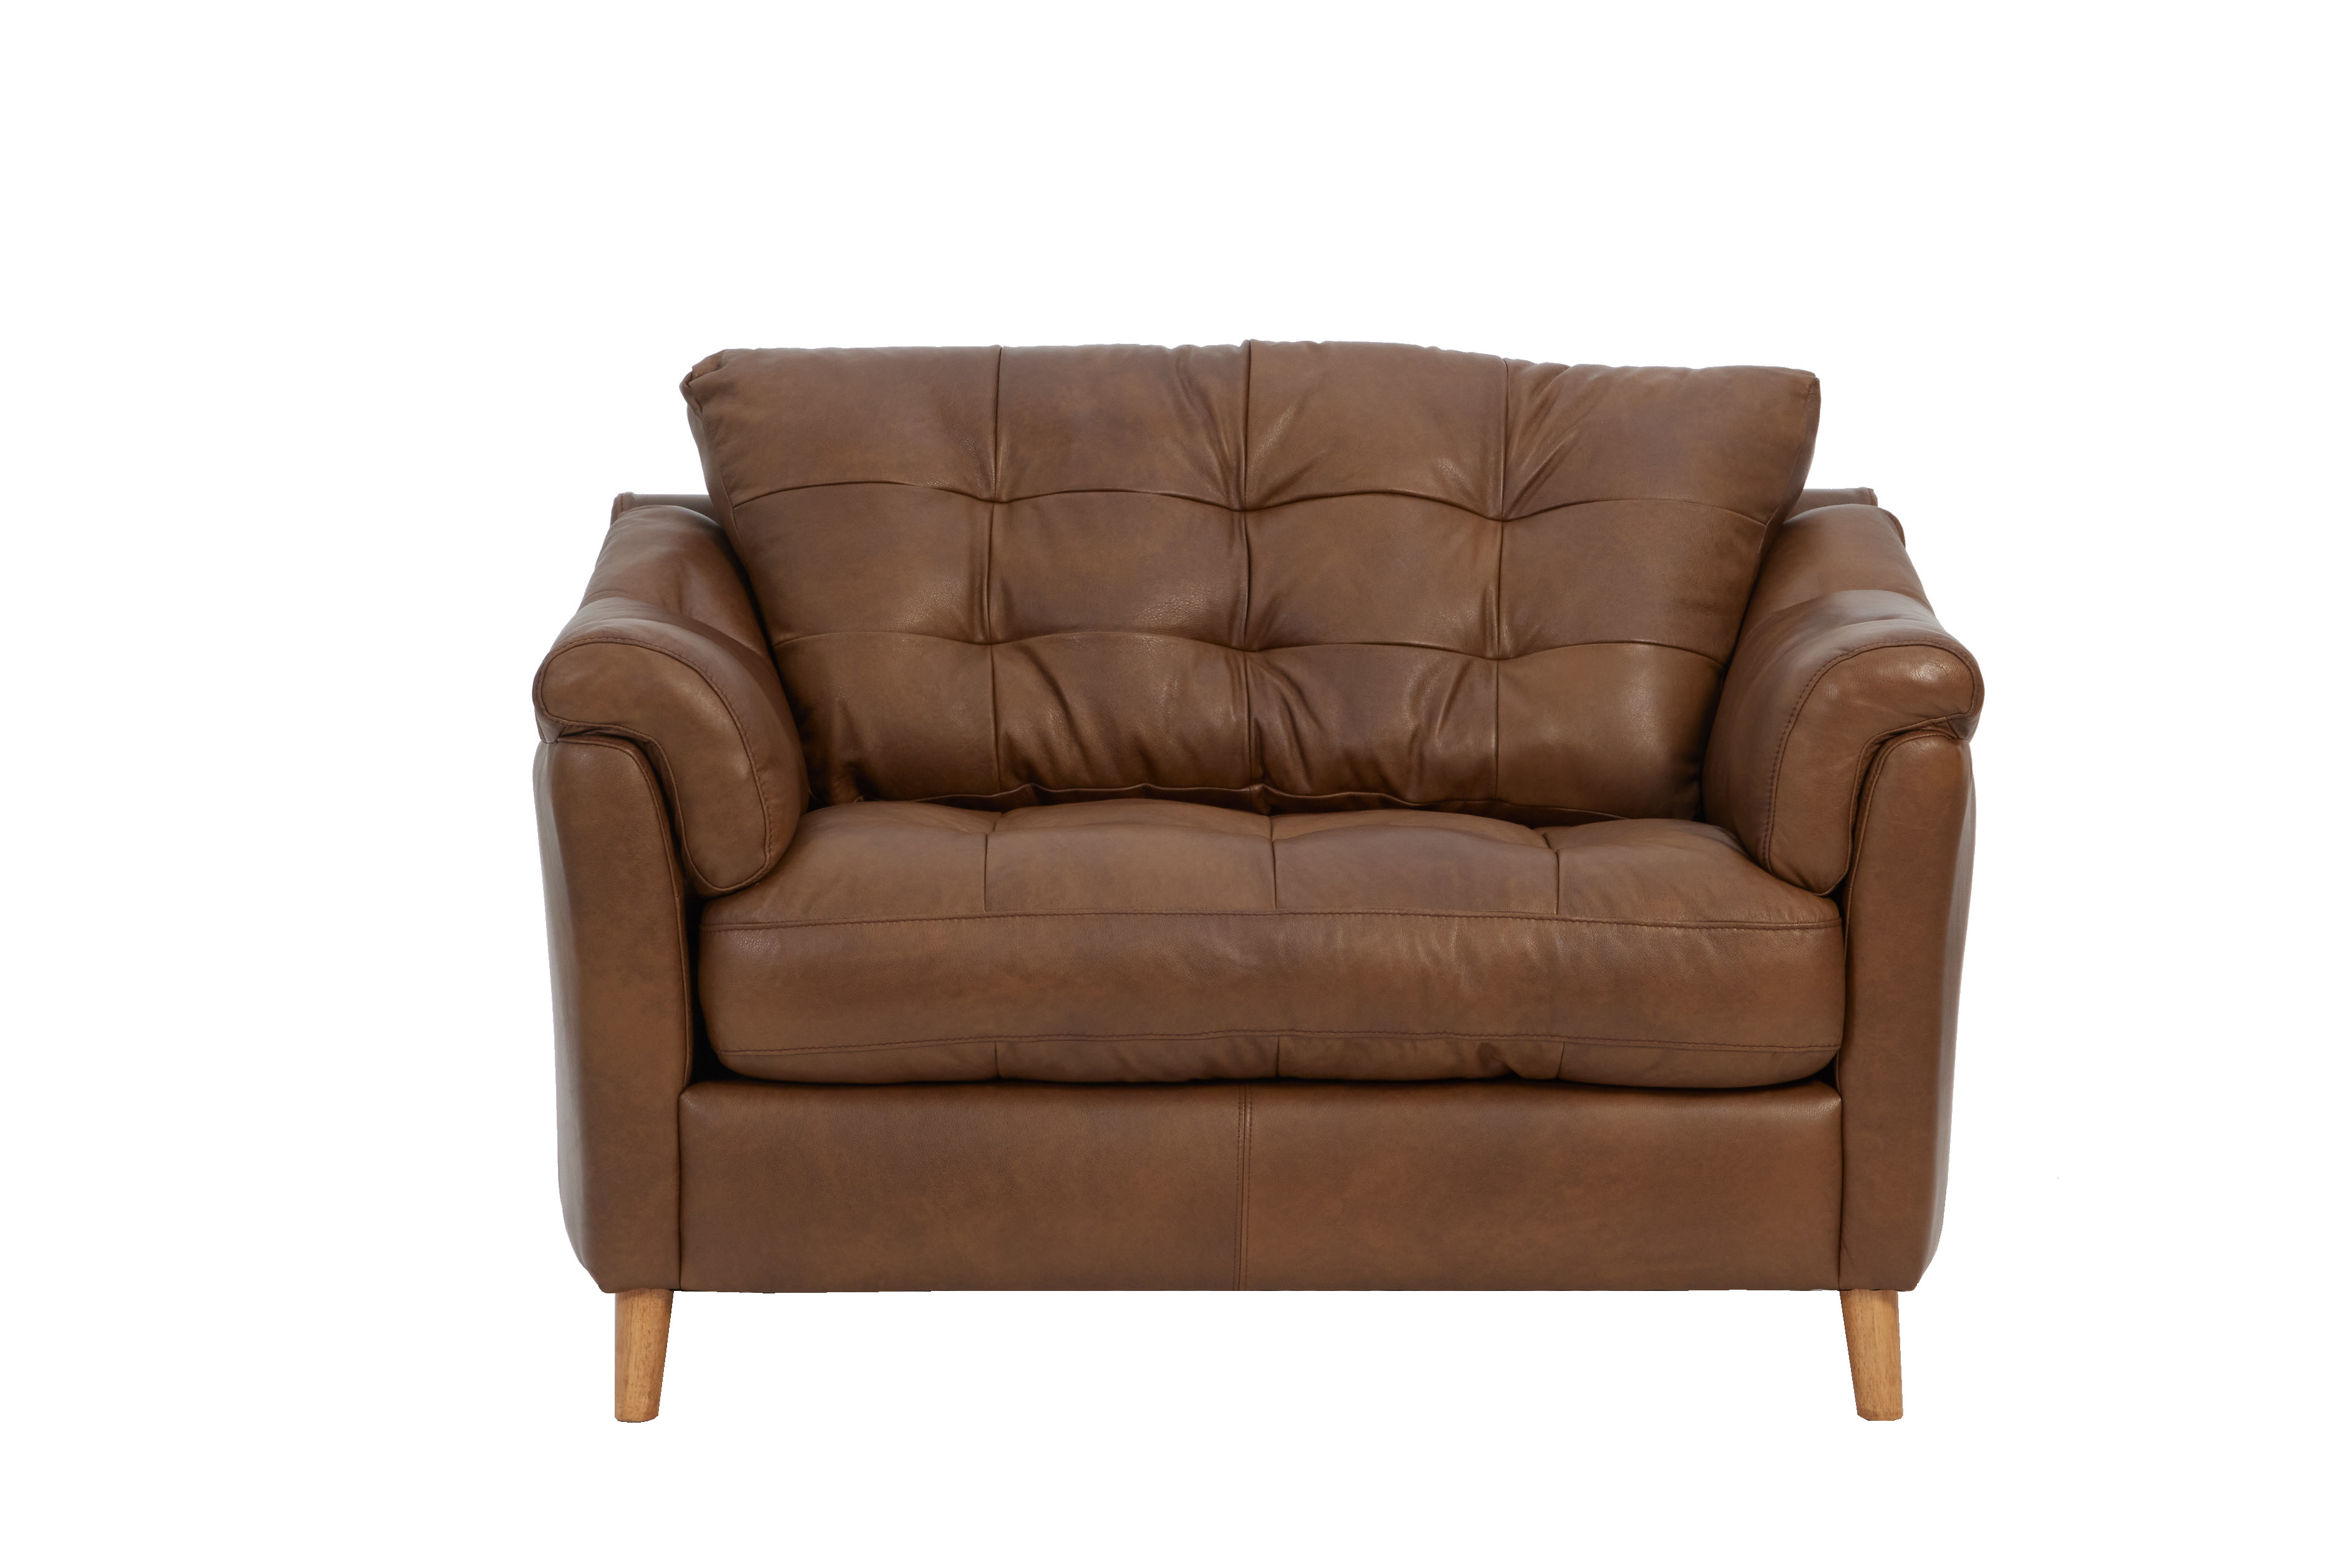 Newmarket Snuggler - Leather